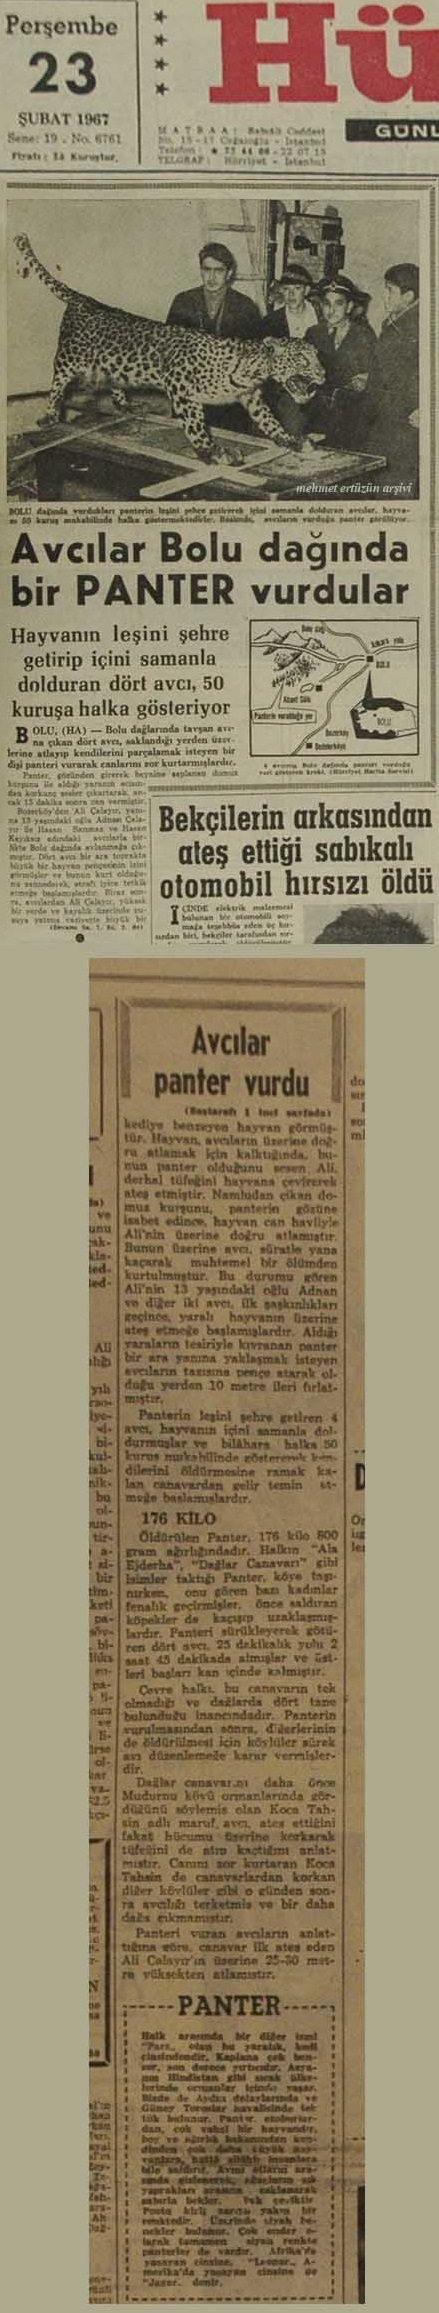 Panter gazete